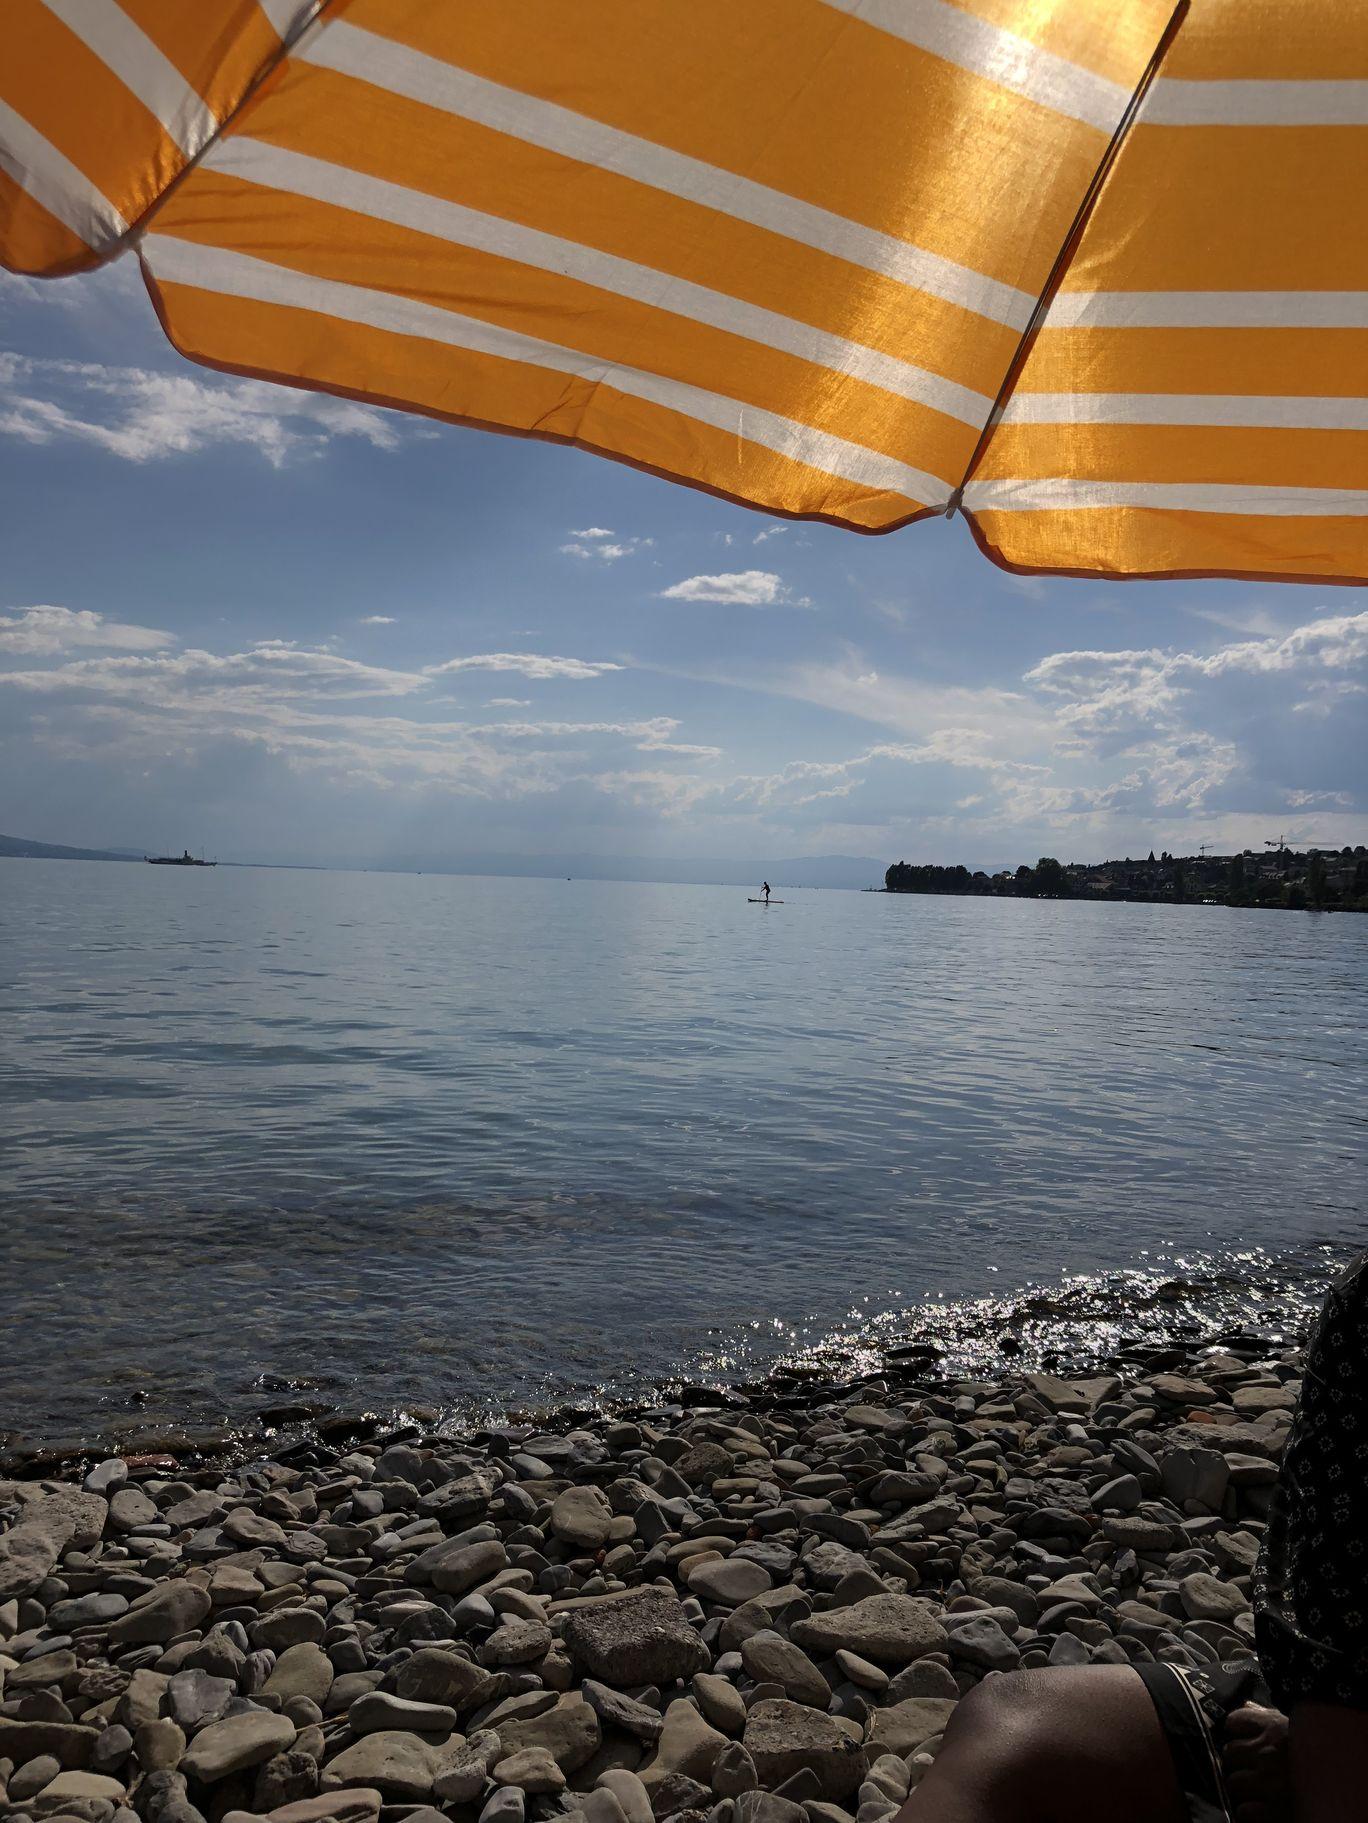 Photo of Lac Leman By sanjana sudheer